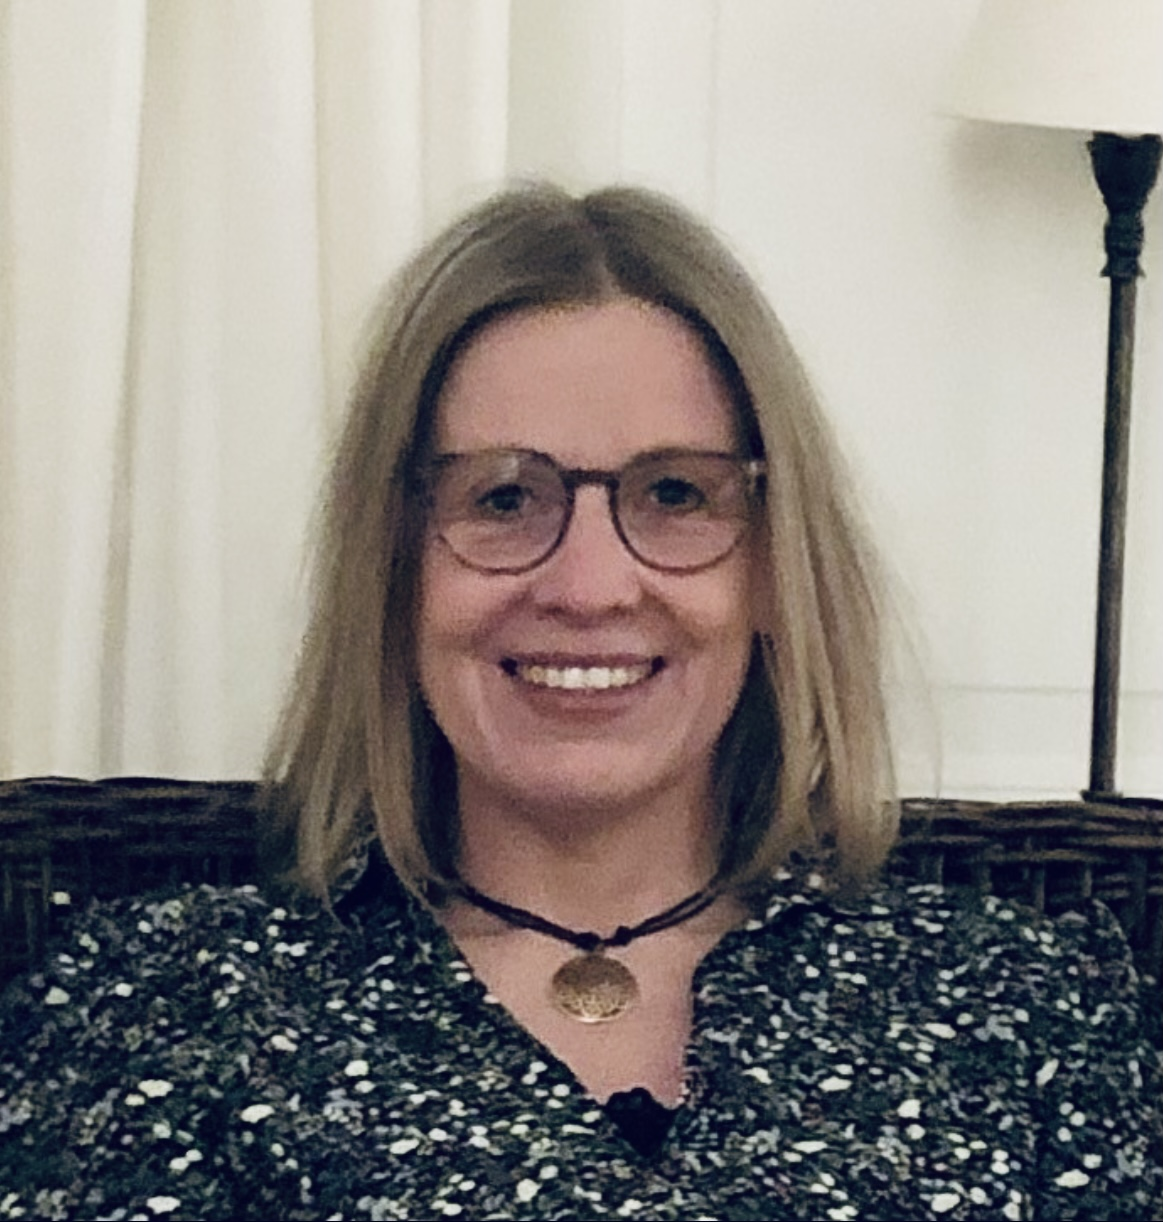 Lotte Christensen selvportræt